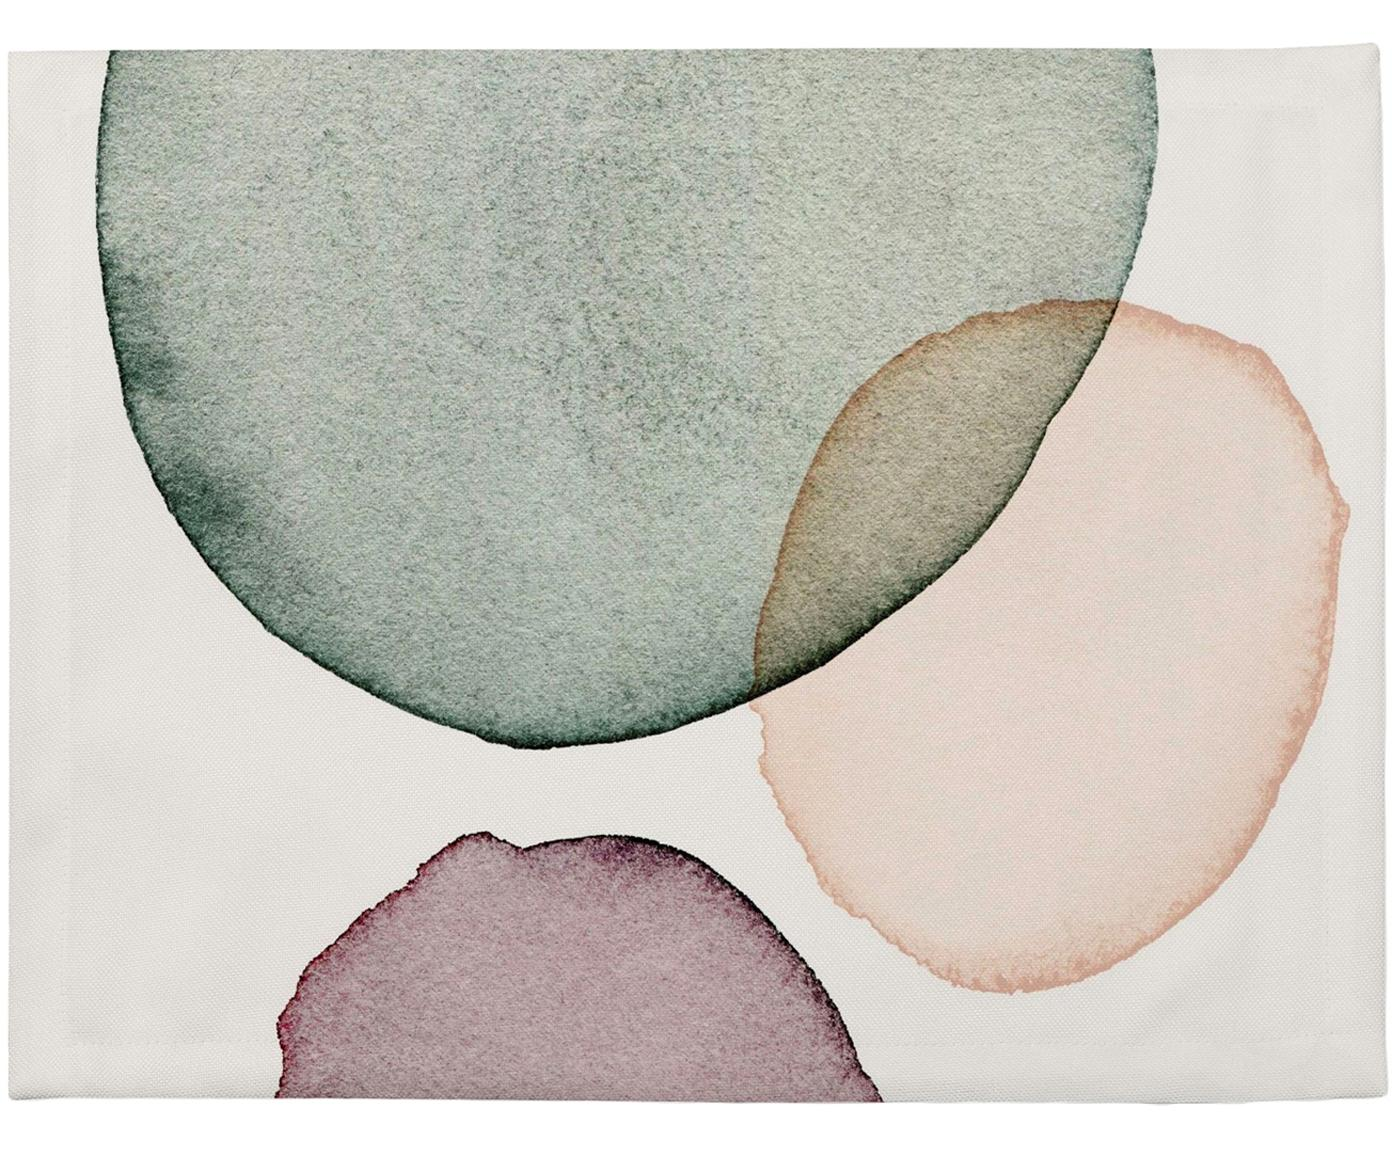 Manteles individuales Calm, 4uds., Poliéster, Blanco, verde, lila, salmón, An 35 x L 45 cm